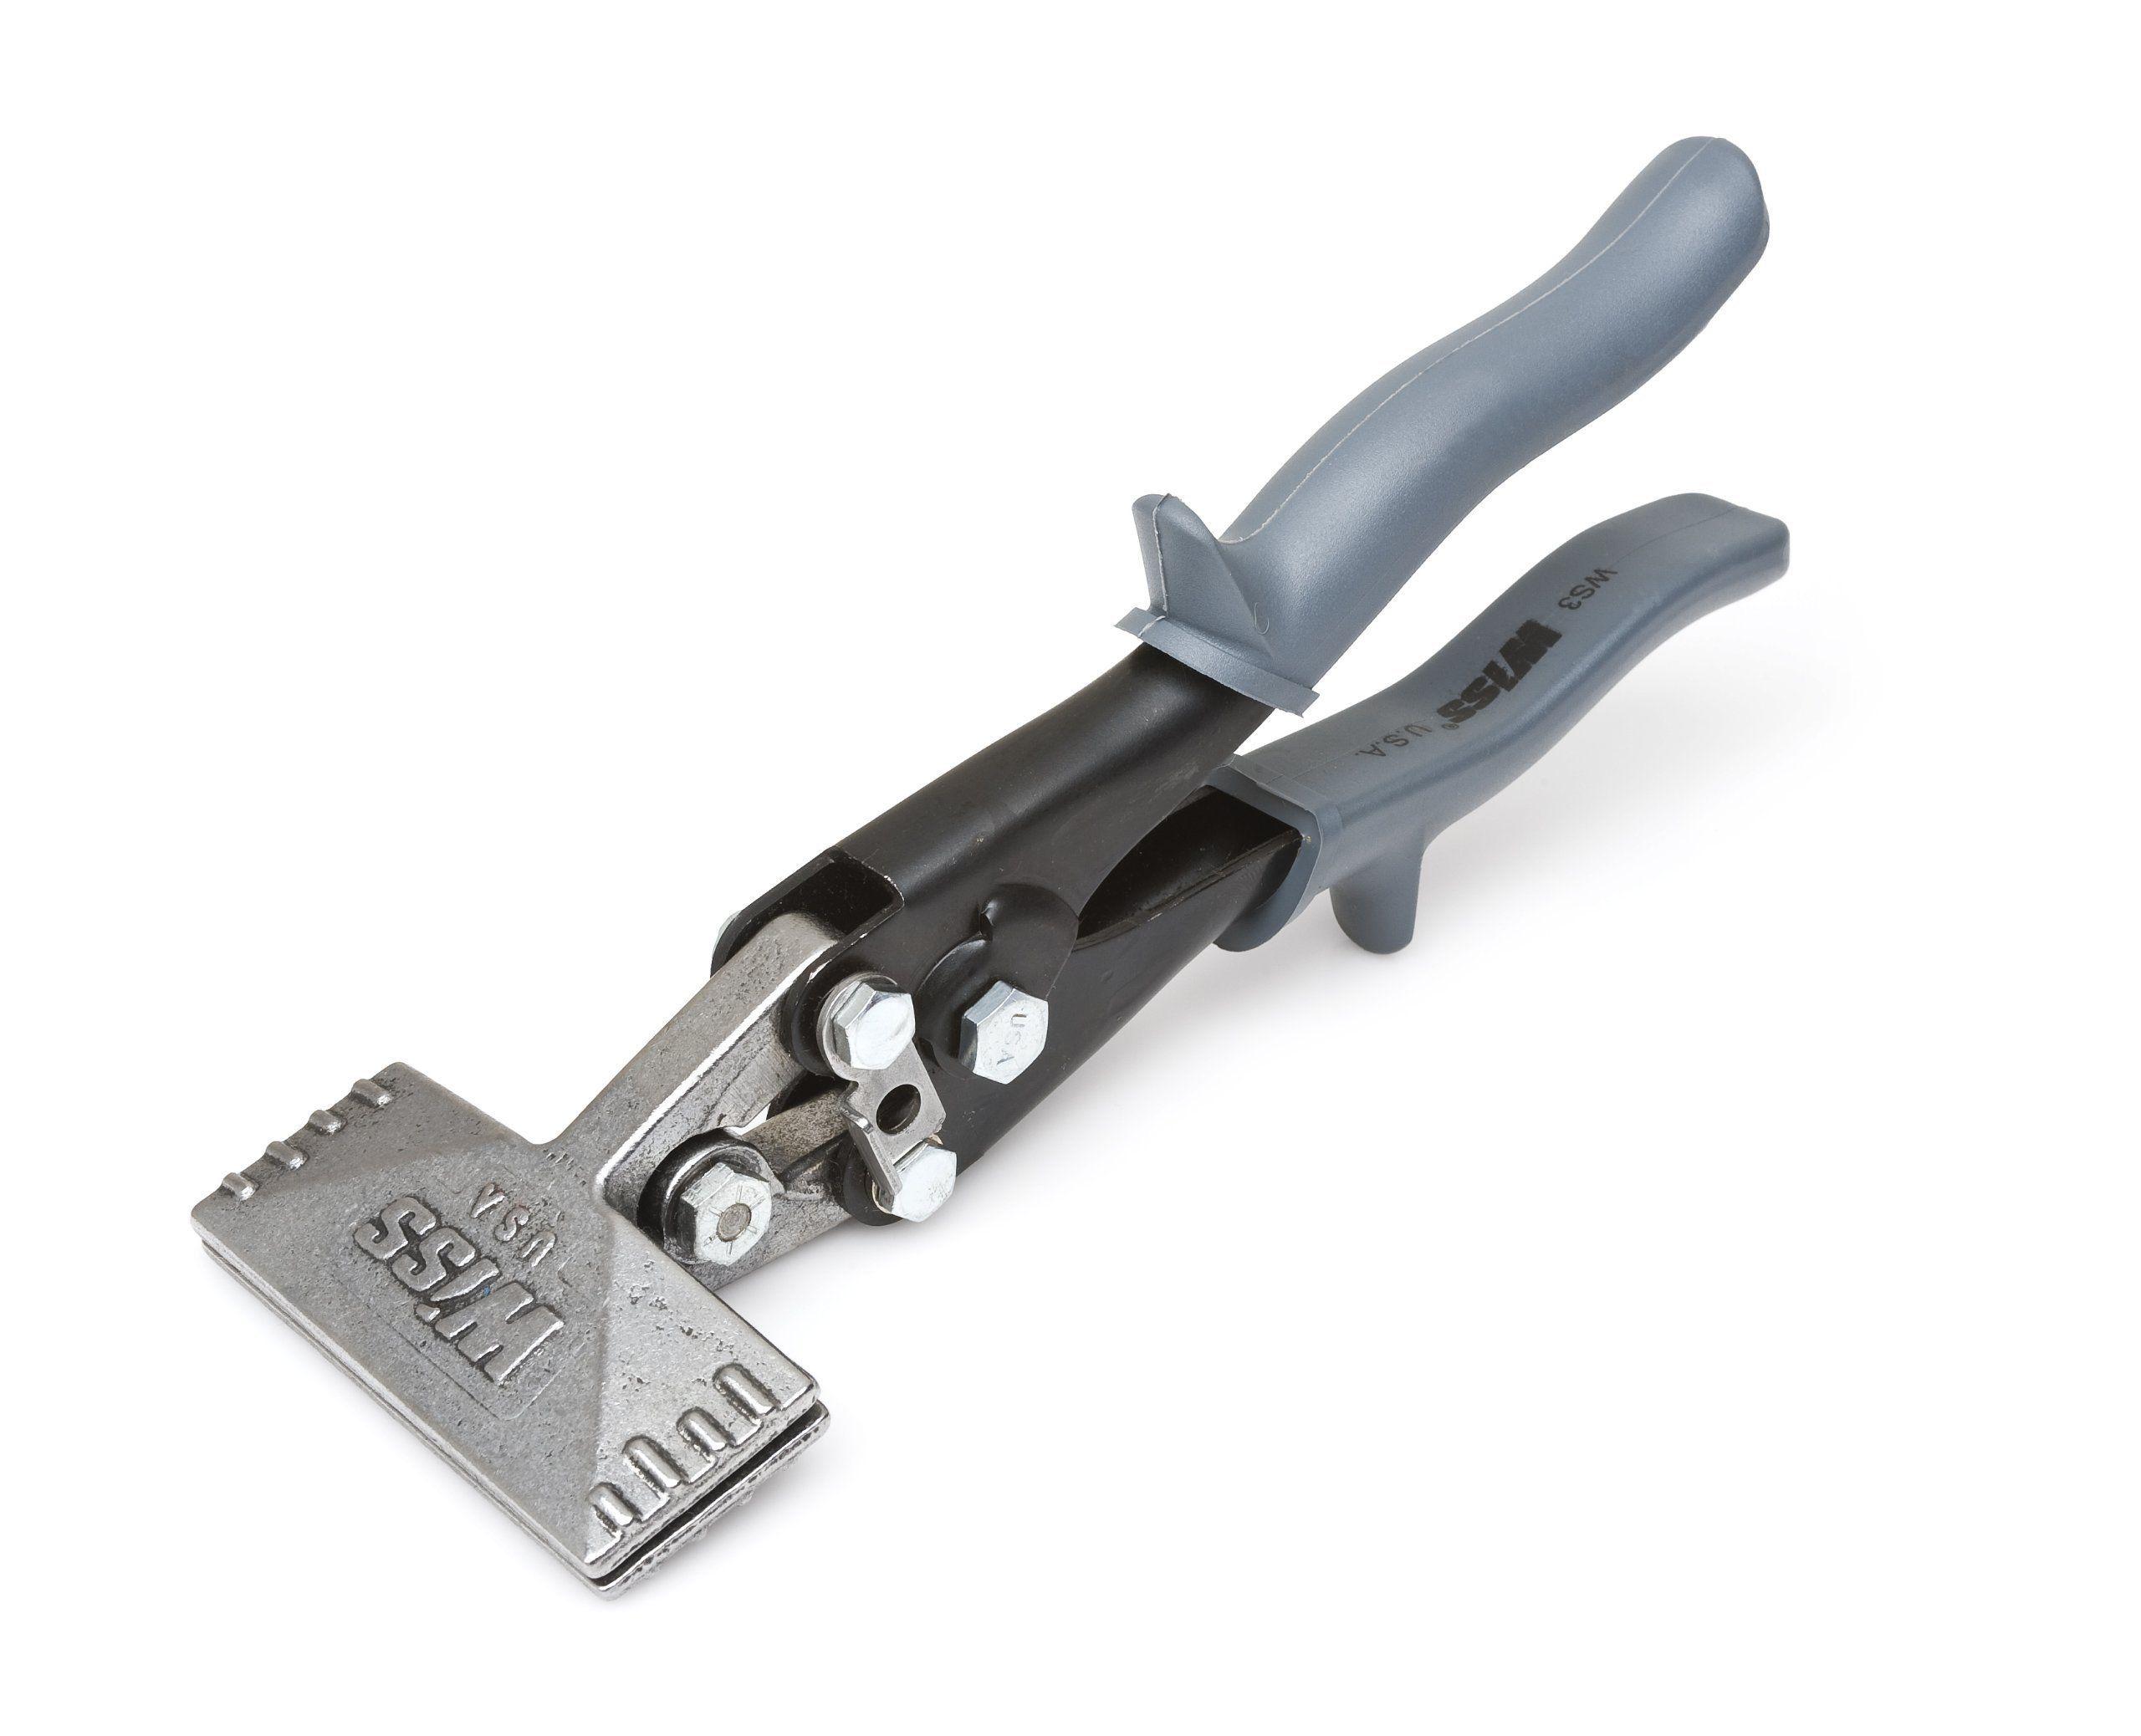 Wiss Ws3 3 Inch Straight Handle Hvac Hand Seamer Power Hand Tools Hand Tools Tools